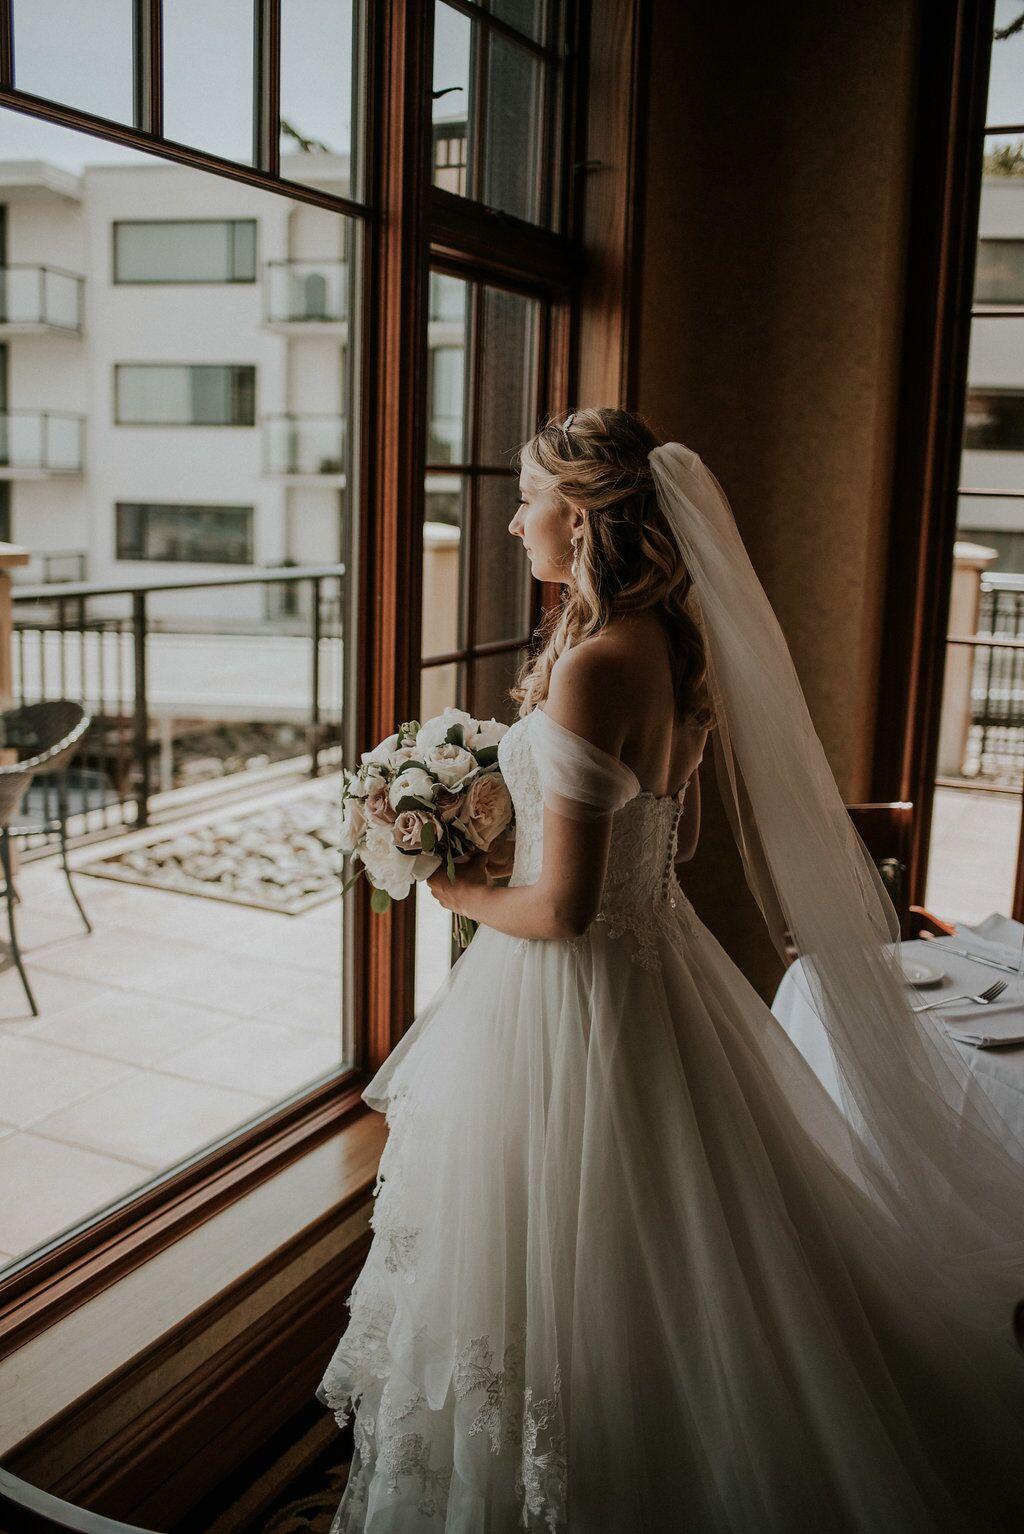 Romantic Bride at Oak Bay Beach Hotel looks out towards the ocean